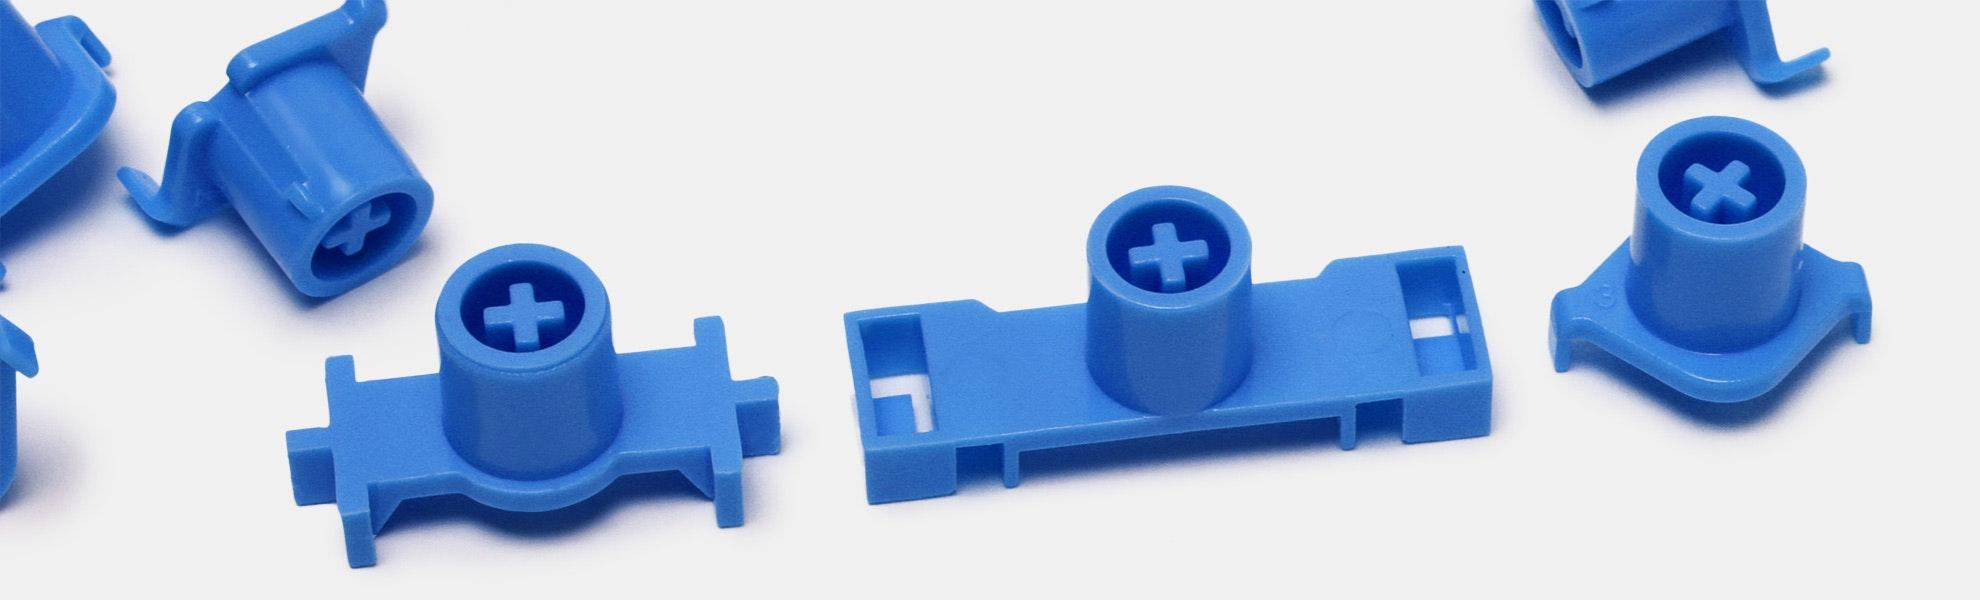 JT Keycaps JTK MX Sliders for Topre